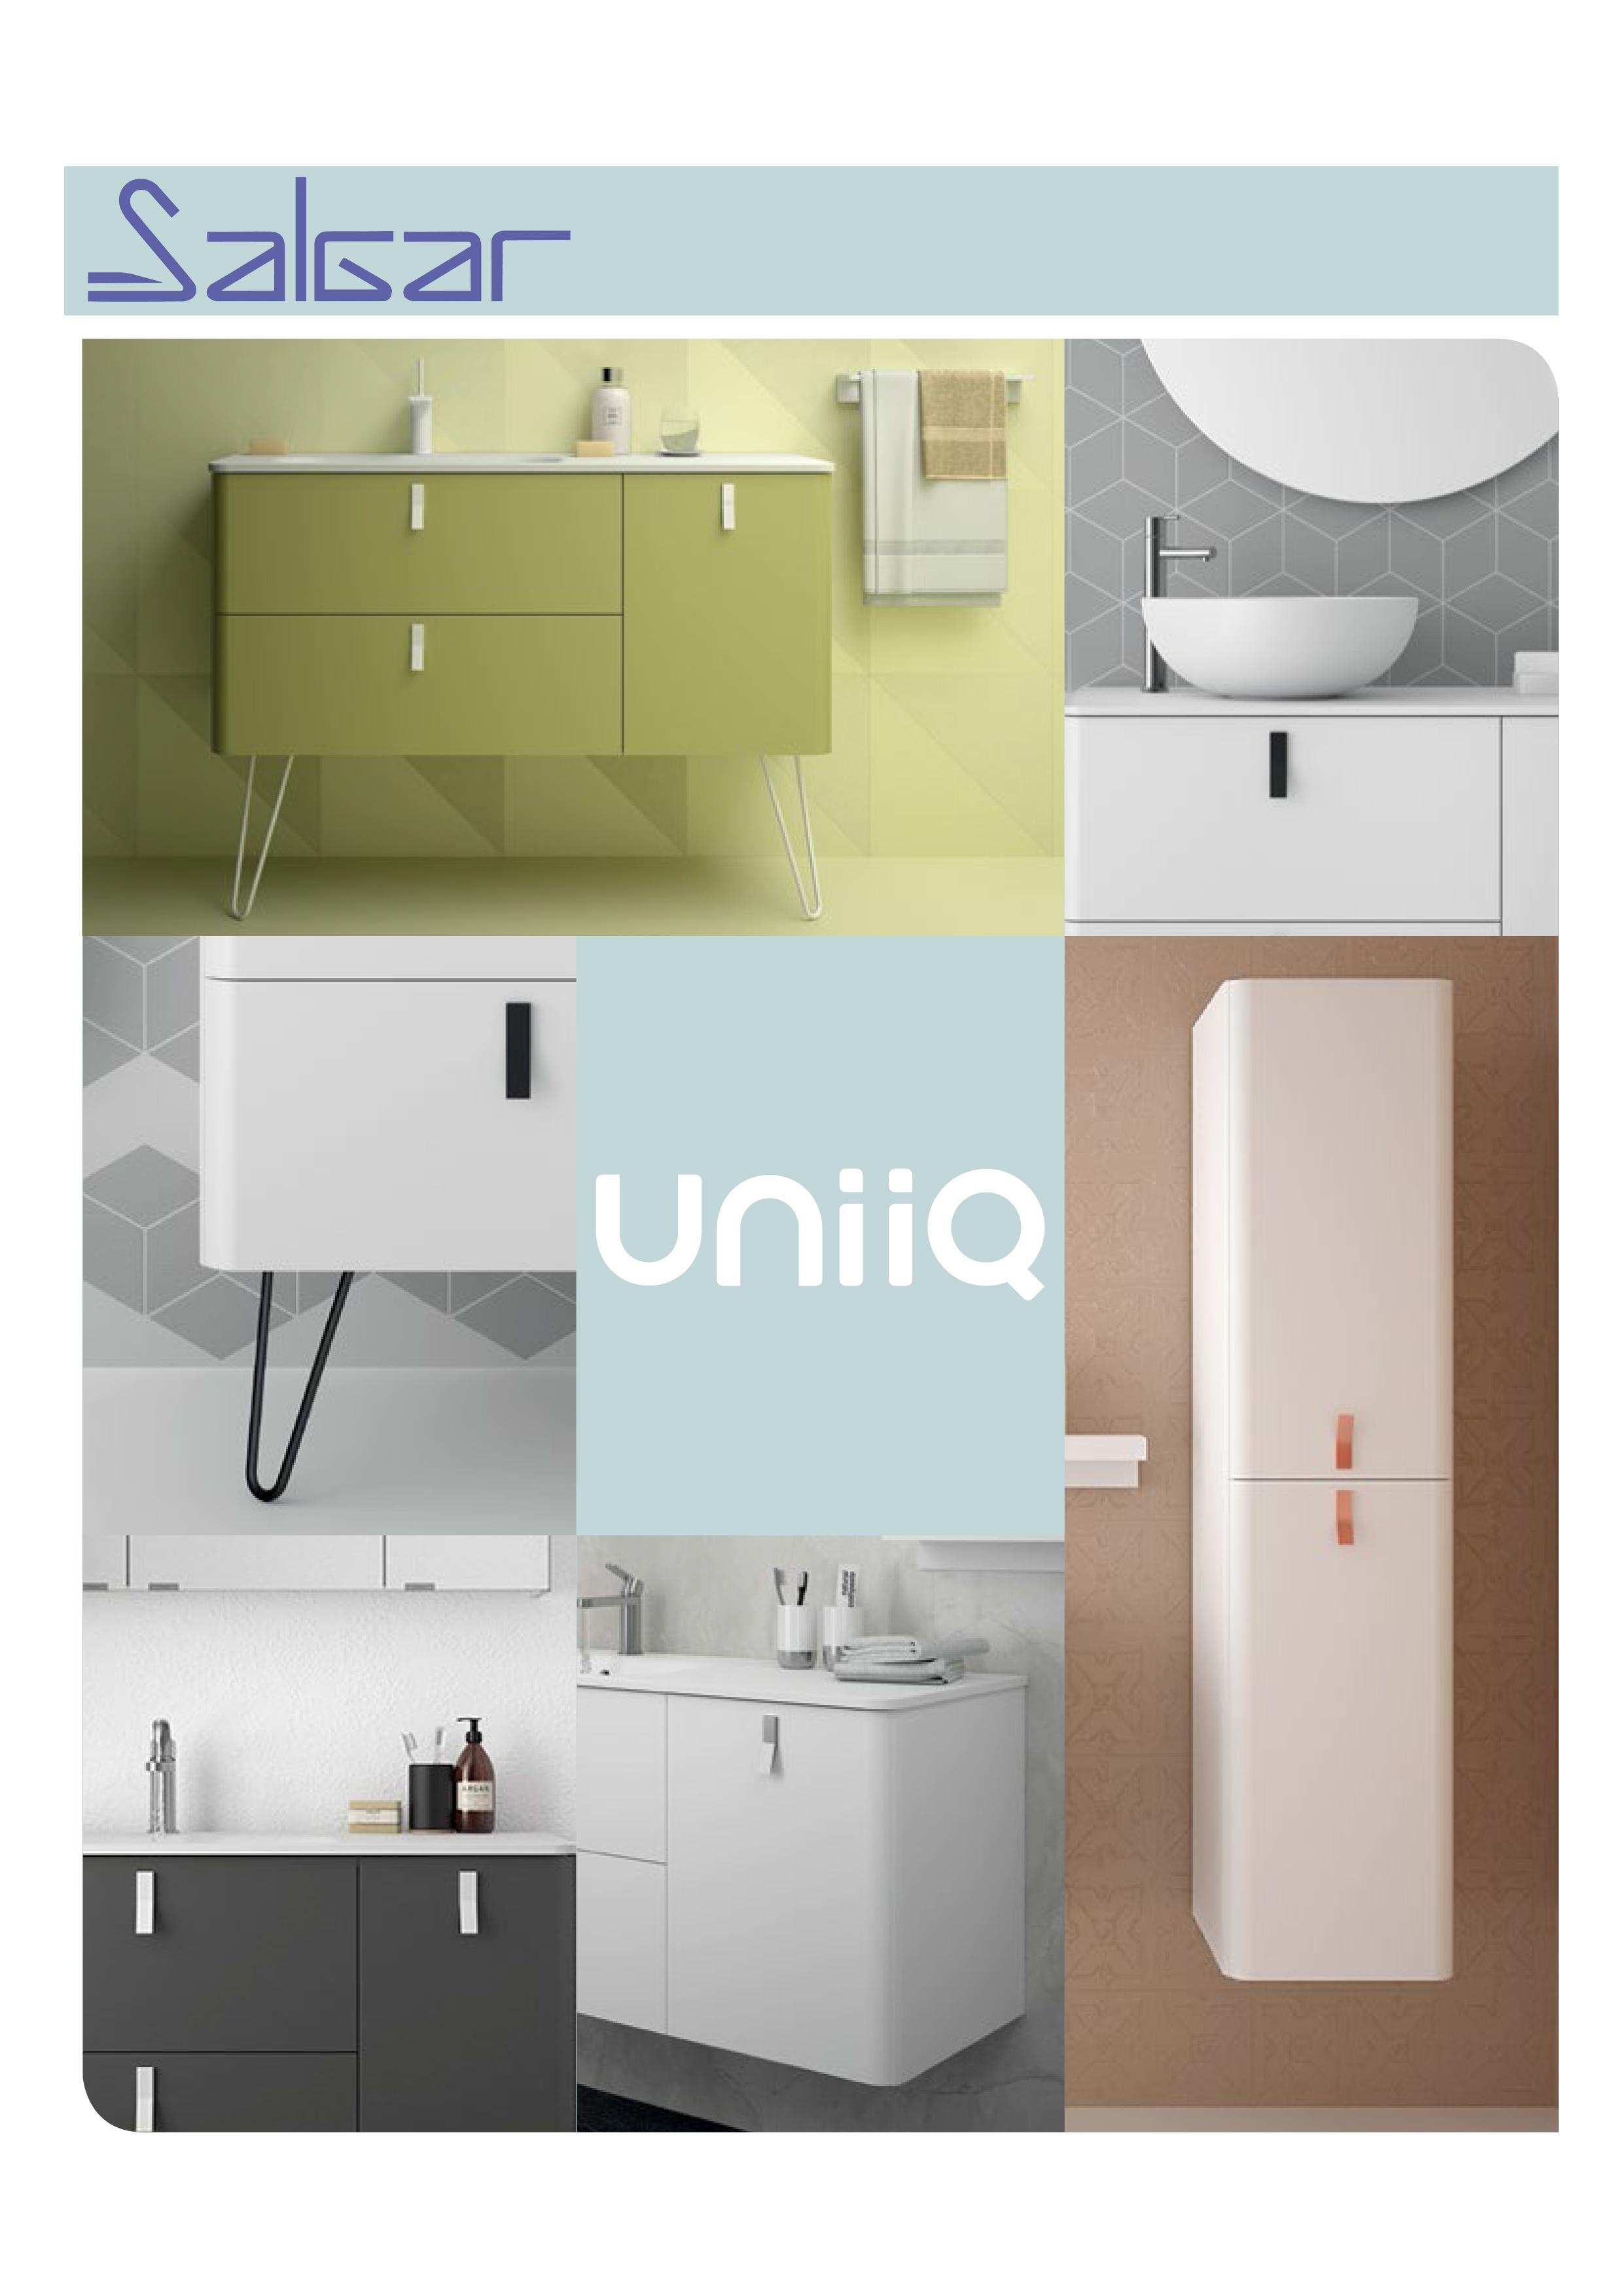 UNIIQ - SALGAR